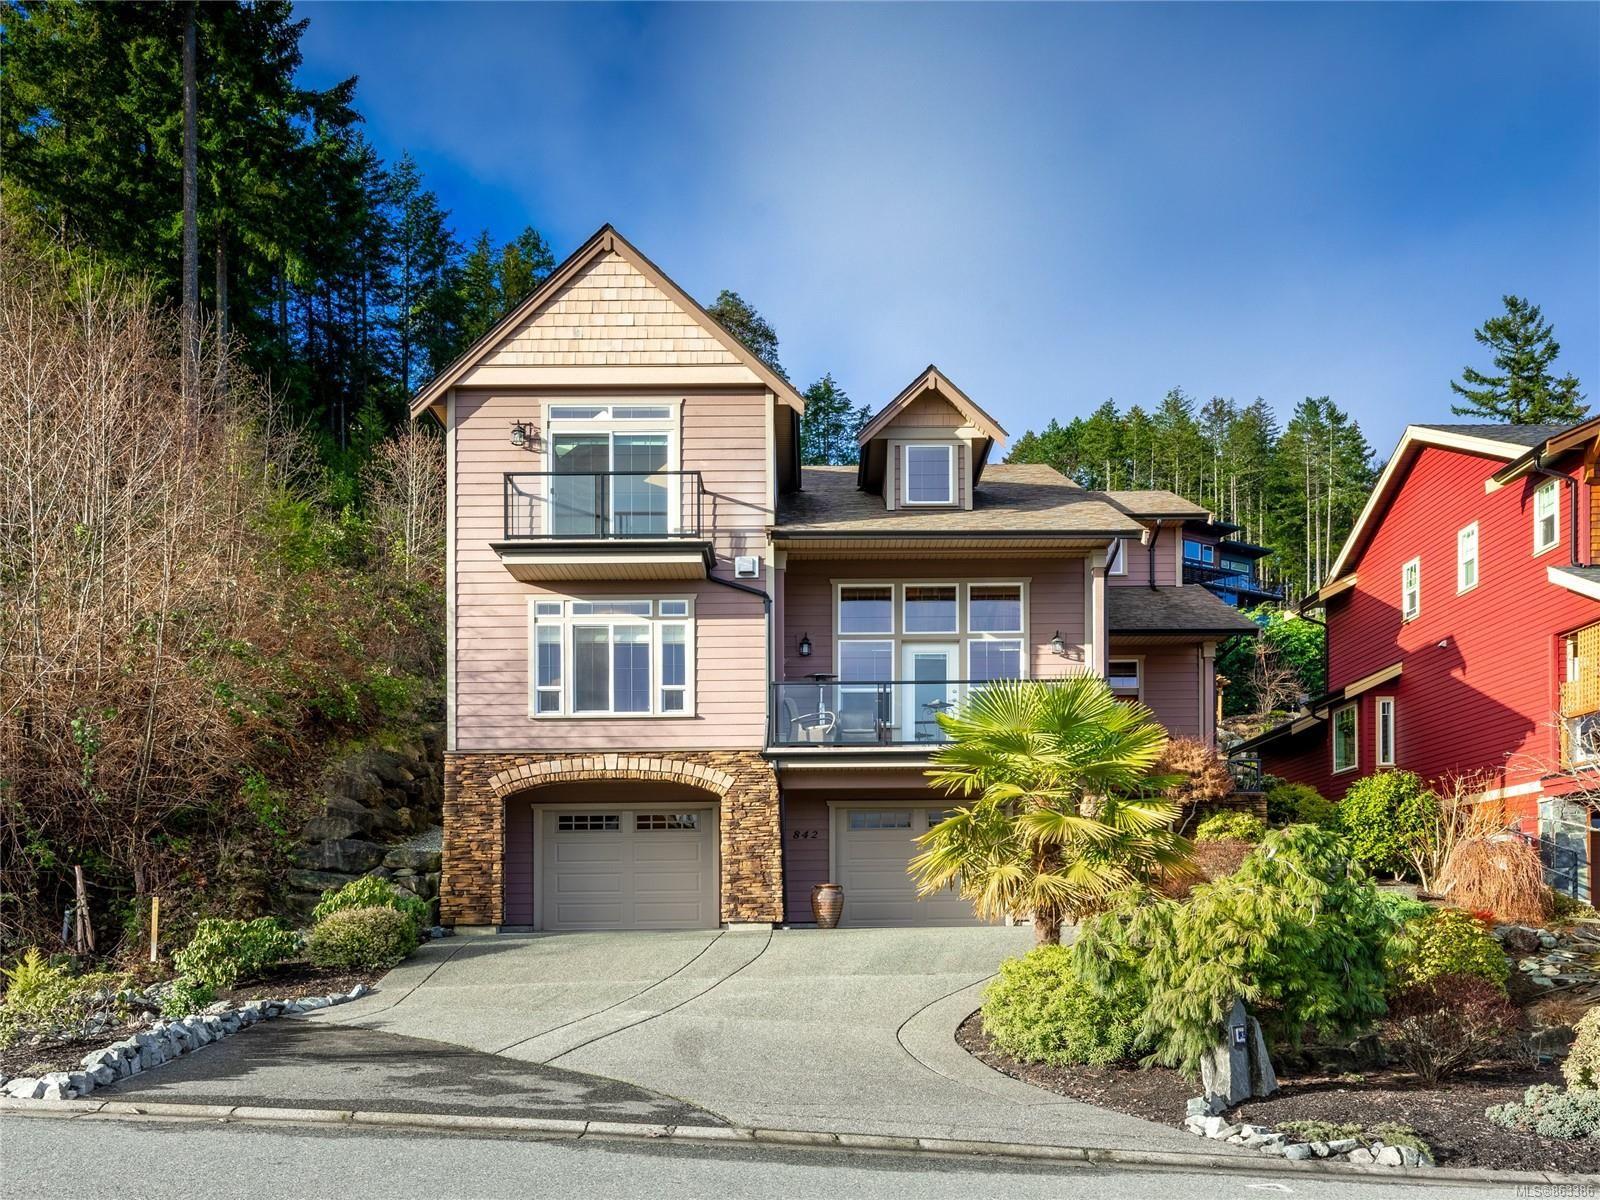 Main Photo: 842 Craig Rd in : Du Ladysmith House for sale (Duncan)  : MLS®# 863386